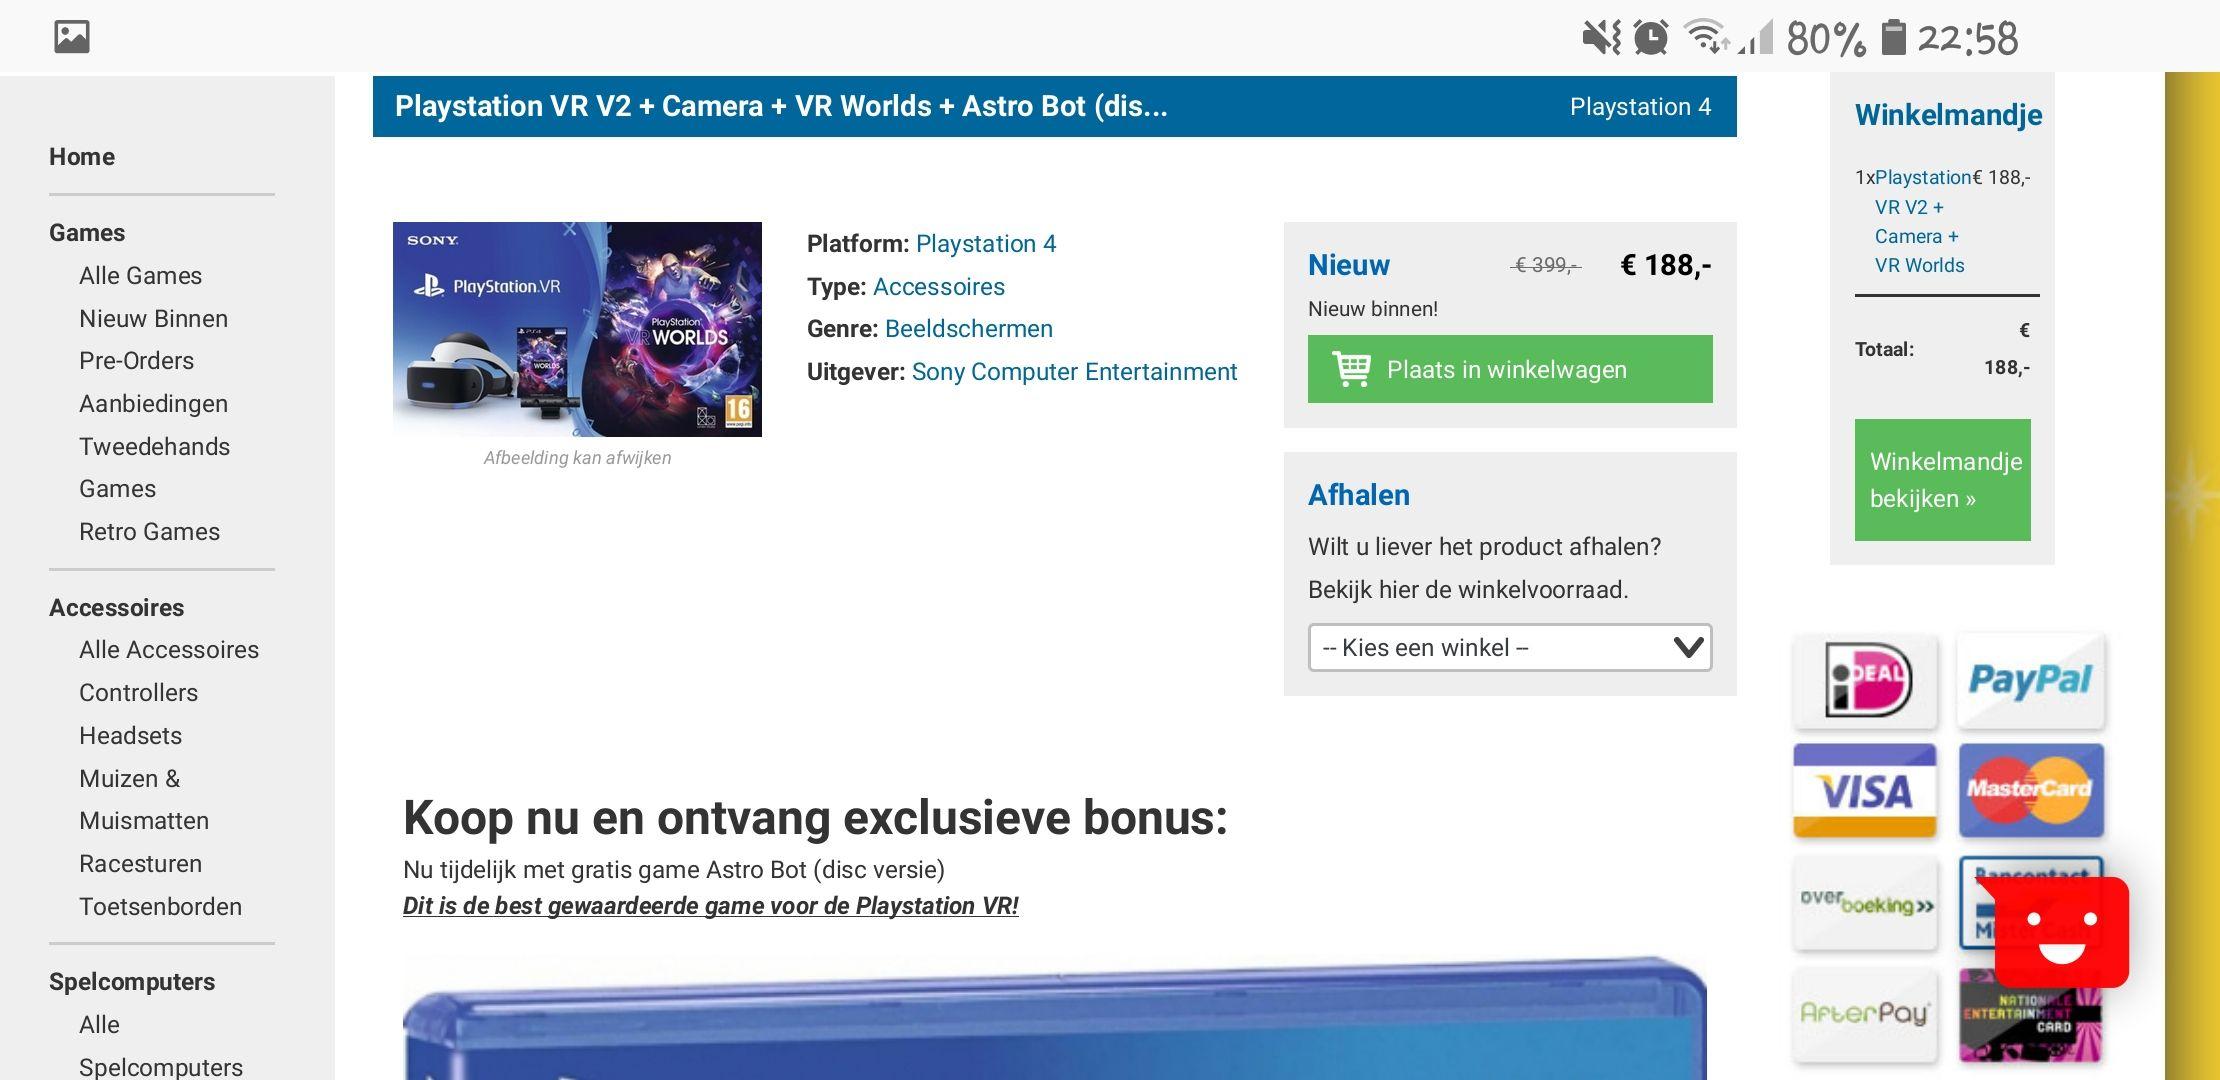 Playstation VR V2 + Camera + VR Worlds + Astro Bot (disc versie)